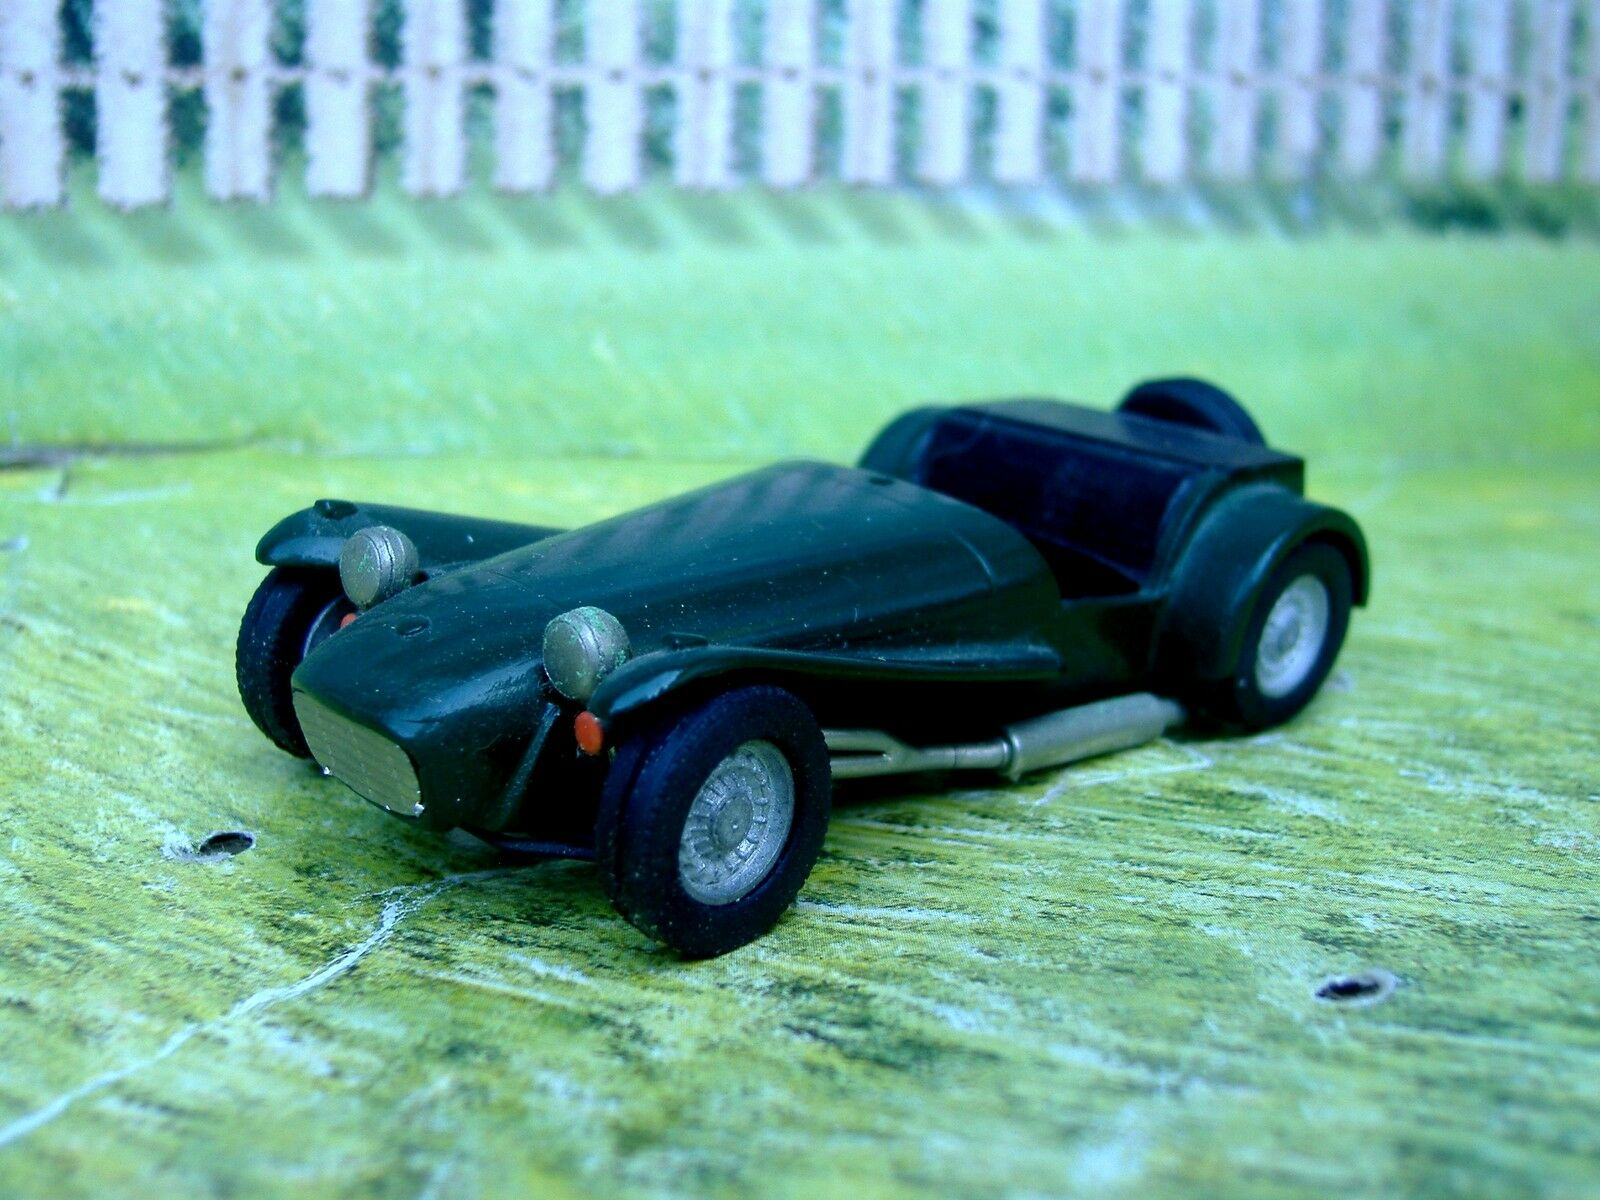 1   43 - nachbildungen (england) lotus super handgefertigte weißen metall - modell car kit